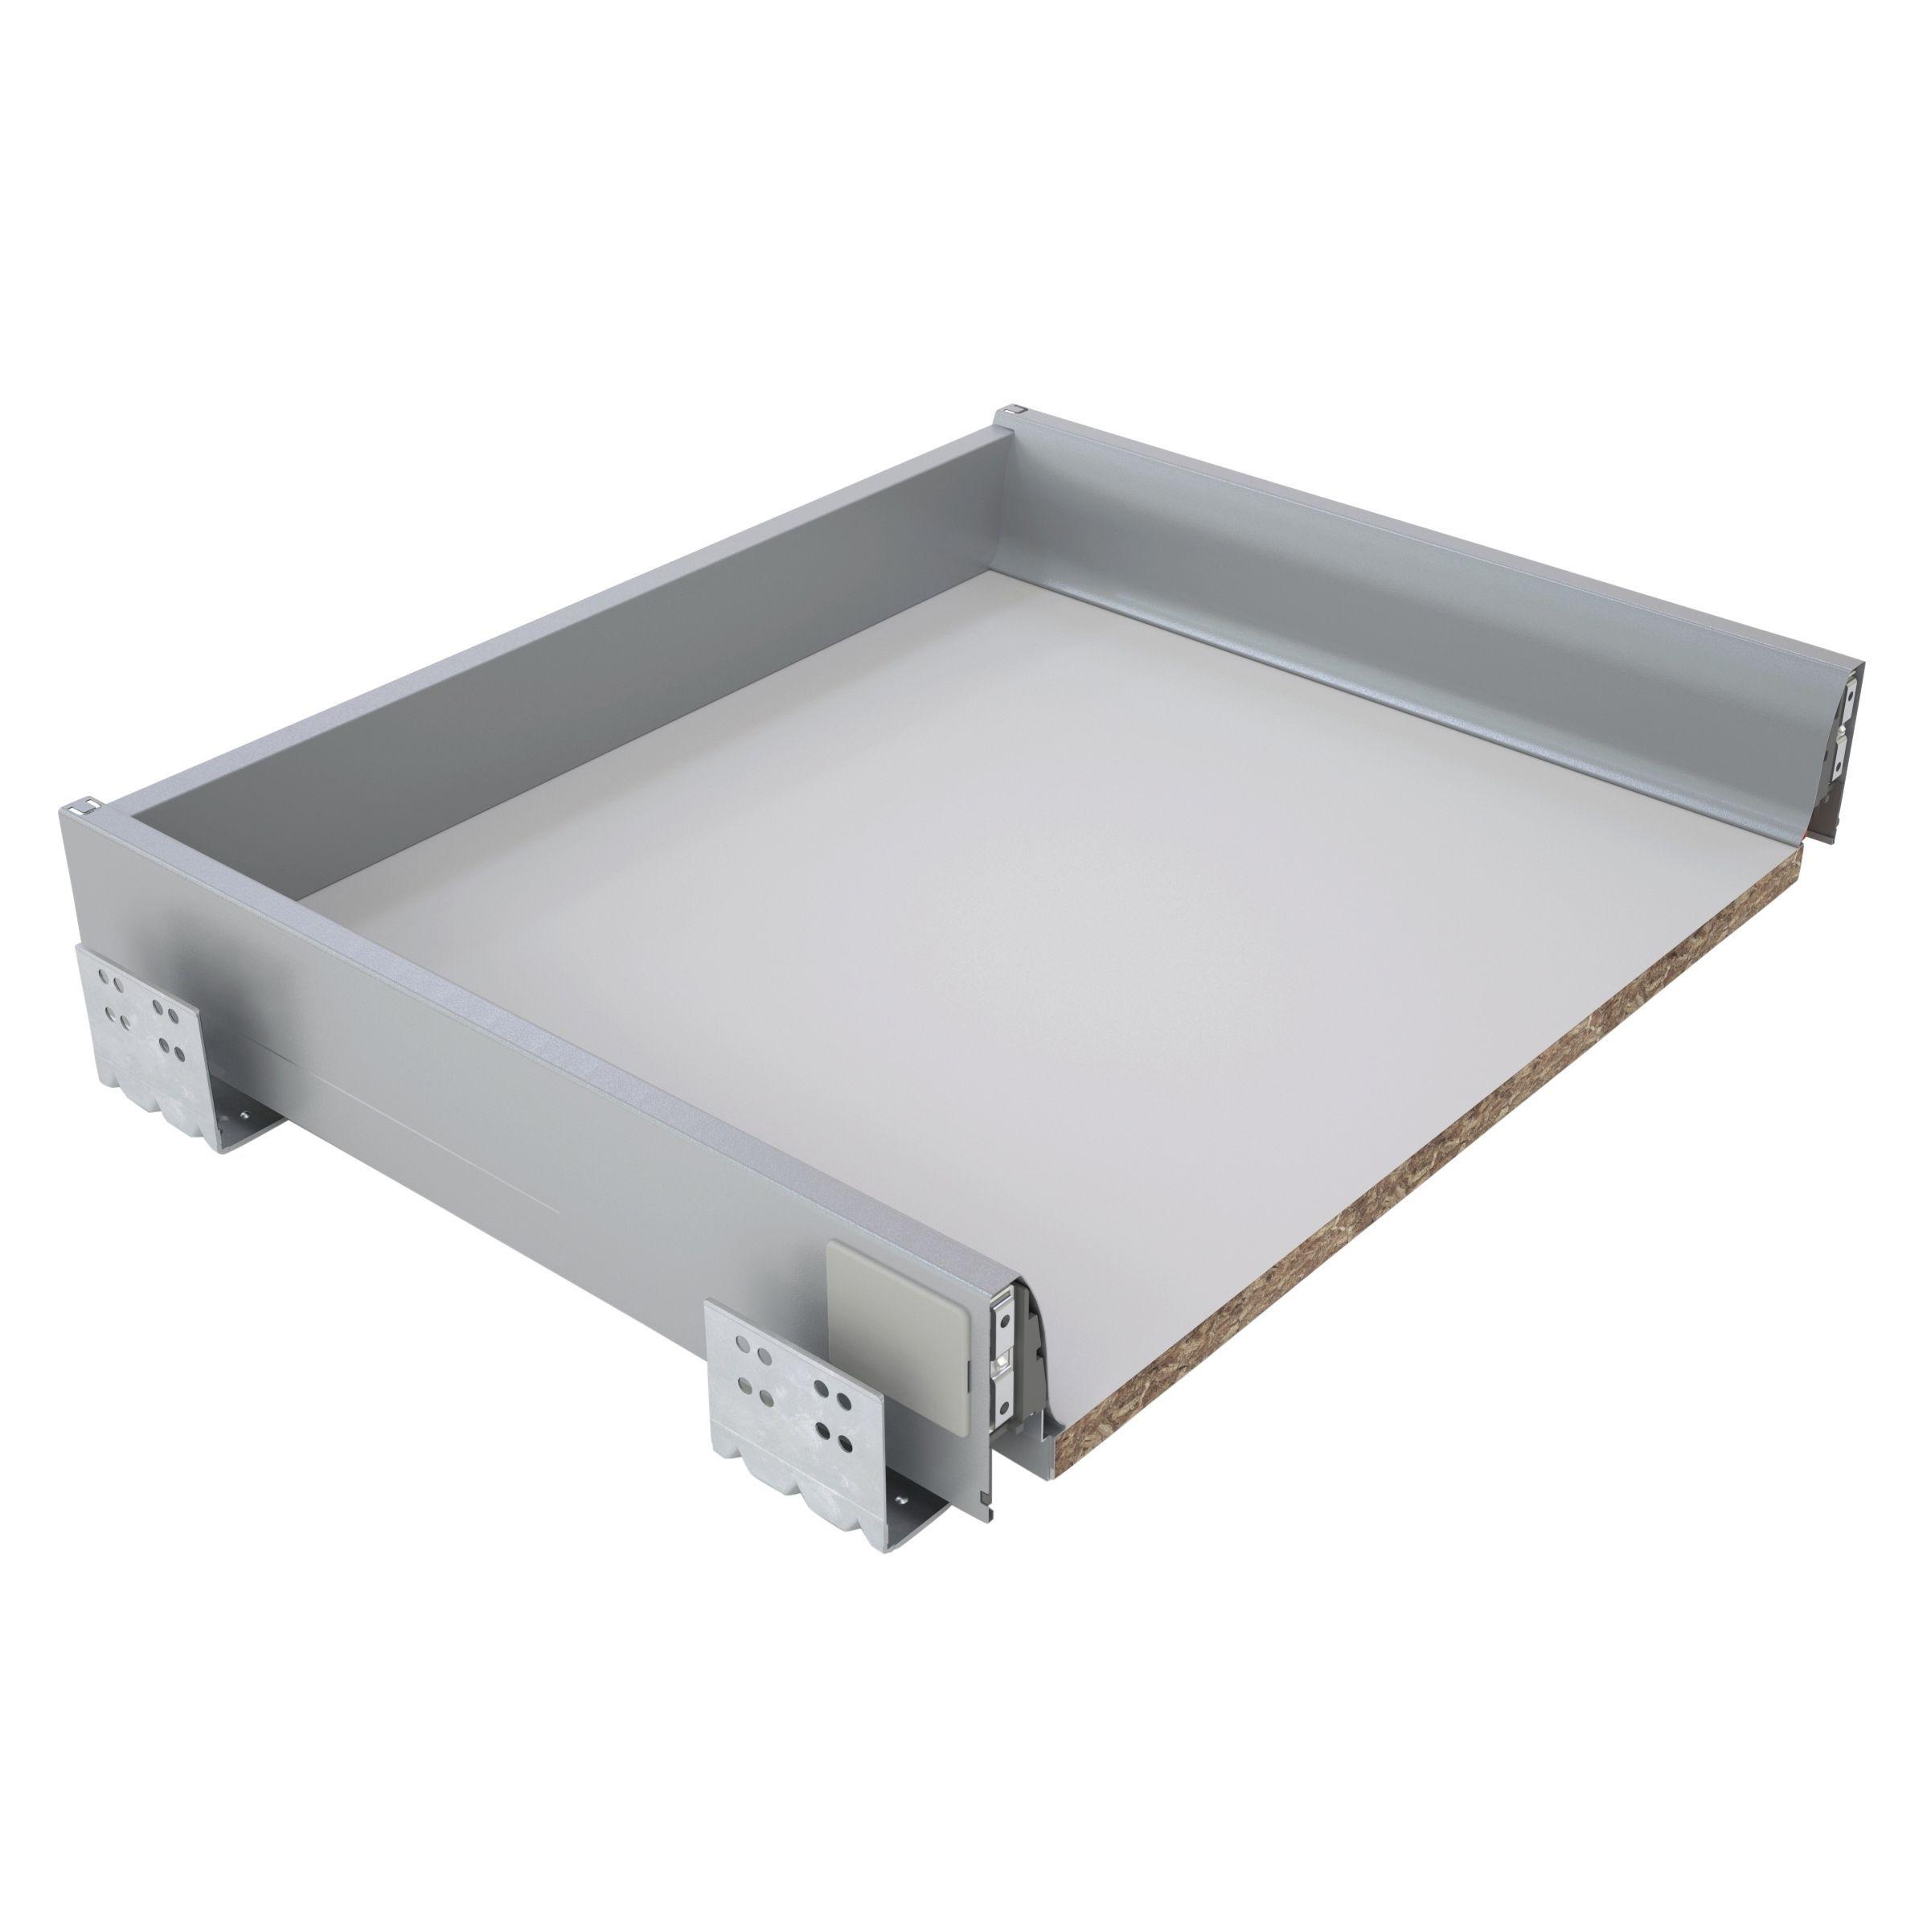 IT Kitchens Premium Framed Soft Close Drawer Box (W)800mm | Drawers ...